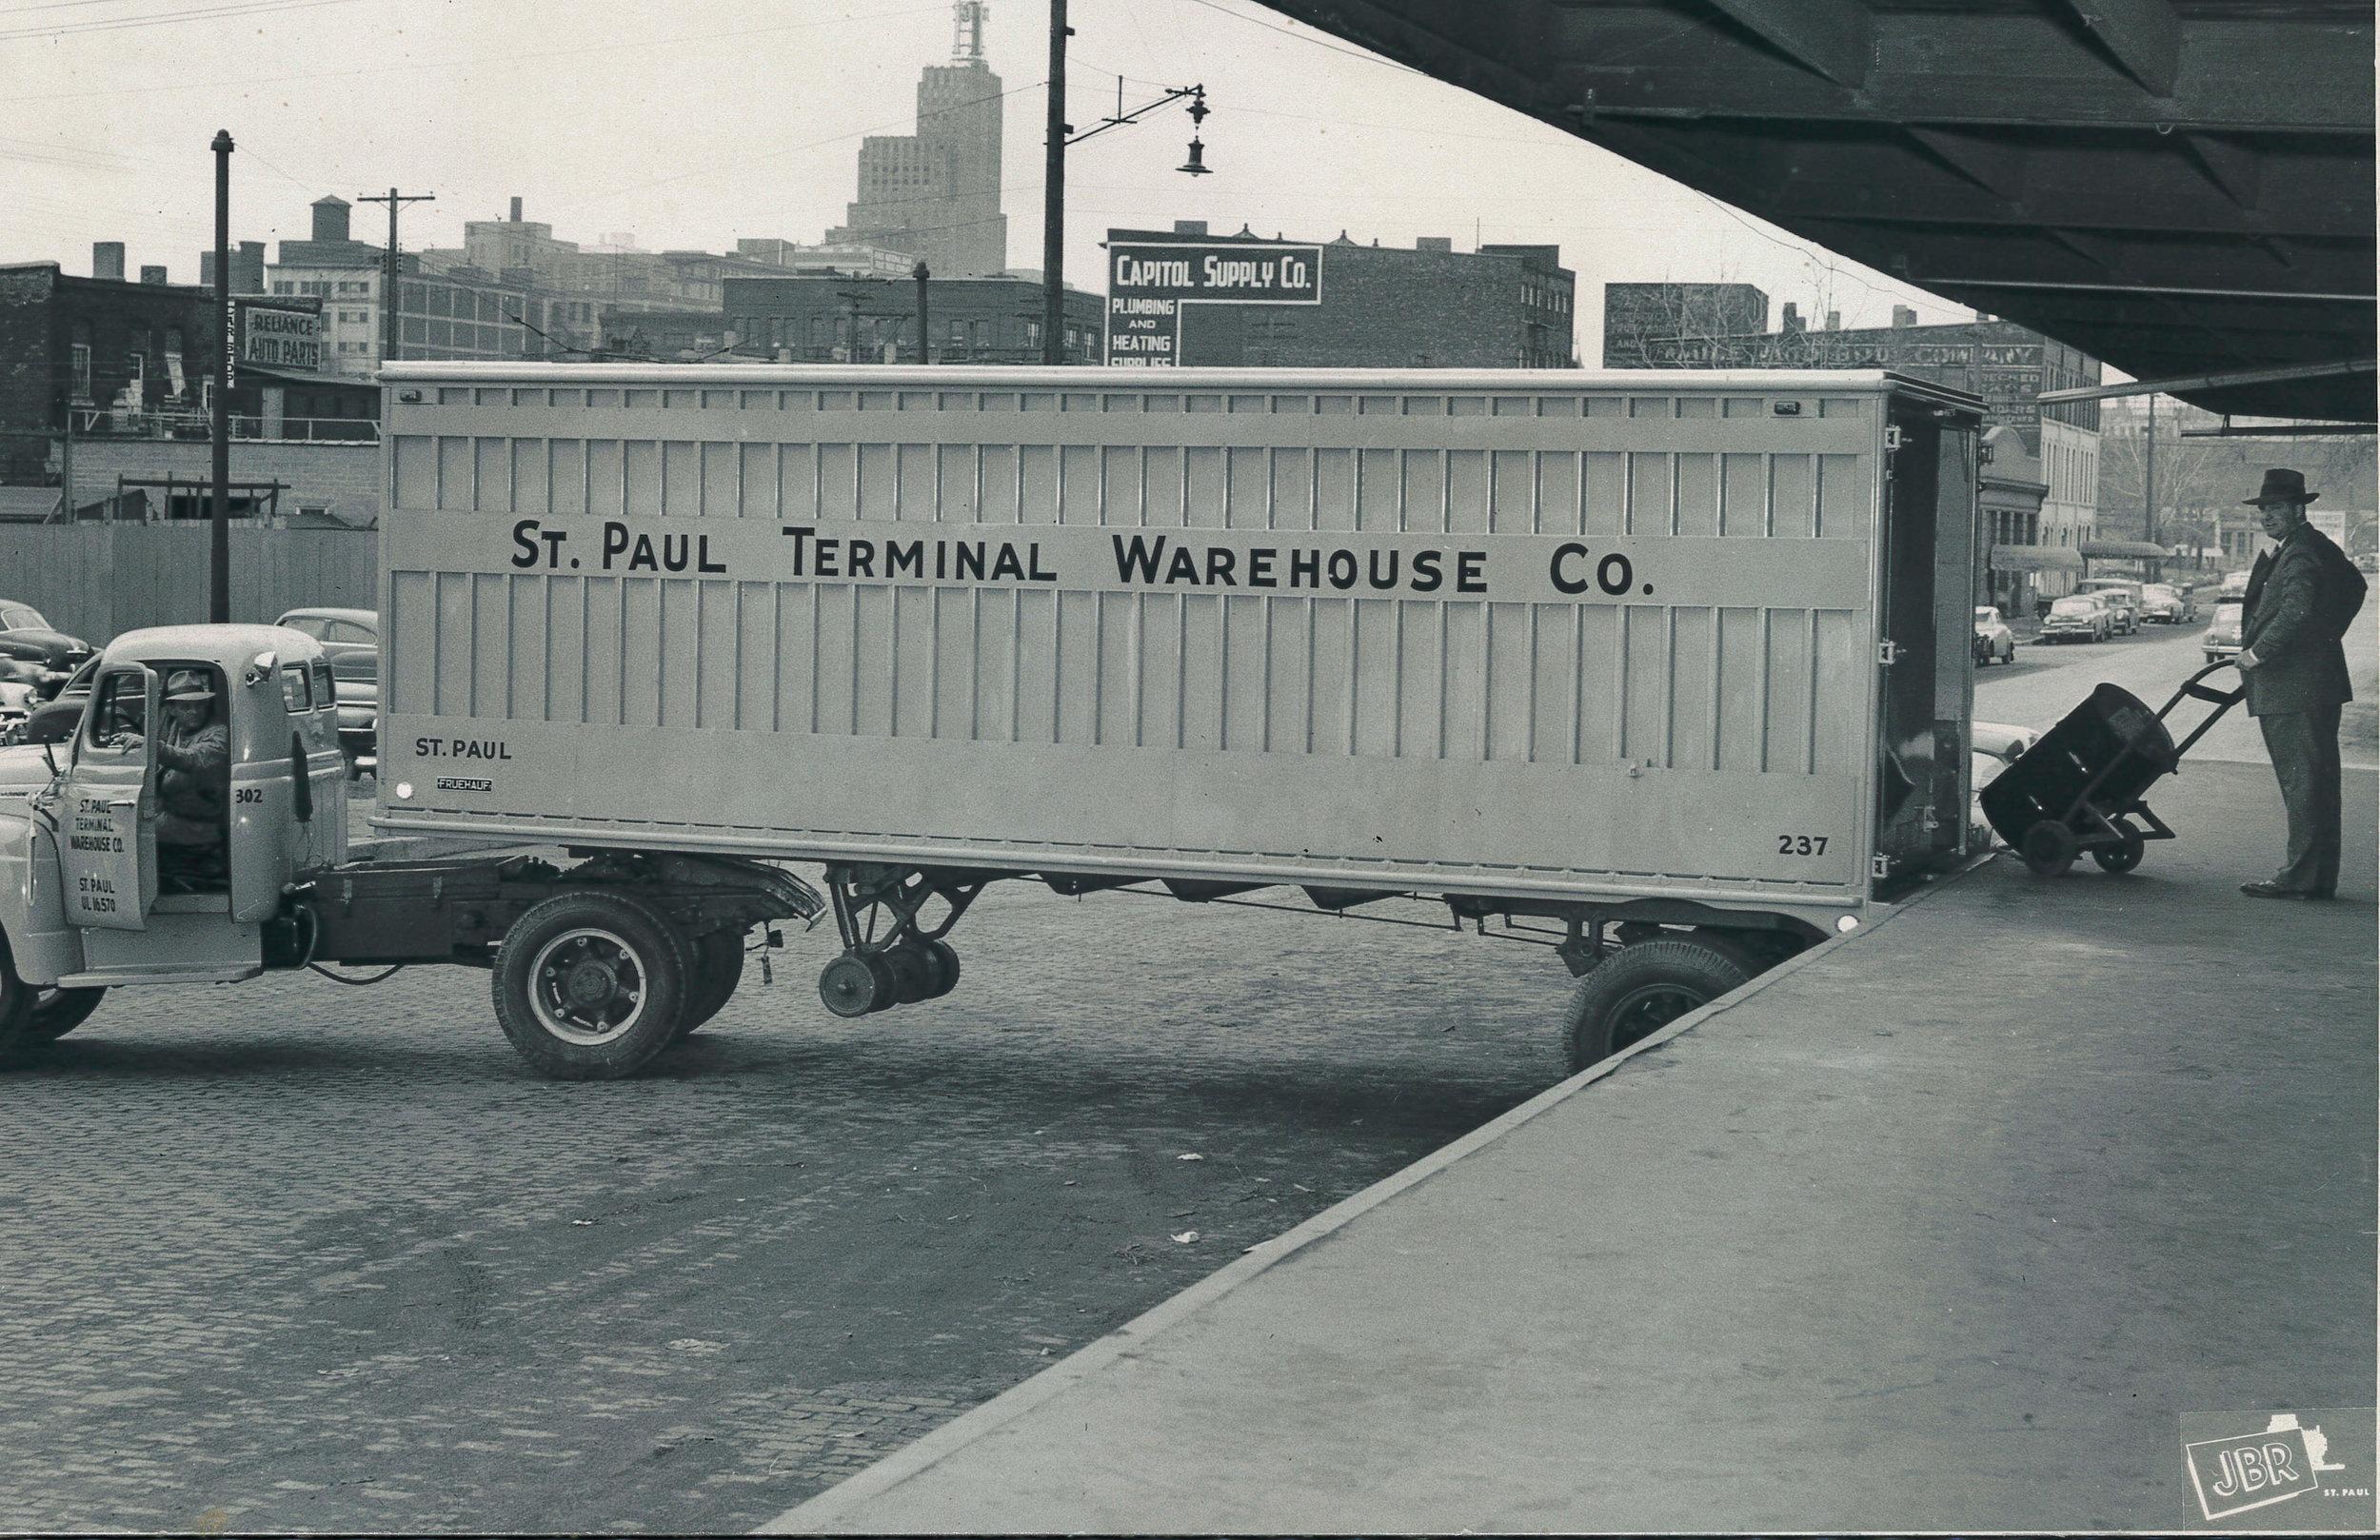 St. Paul Terminal Warehouse Truck 2.jpg